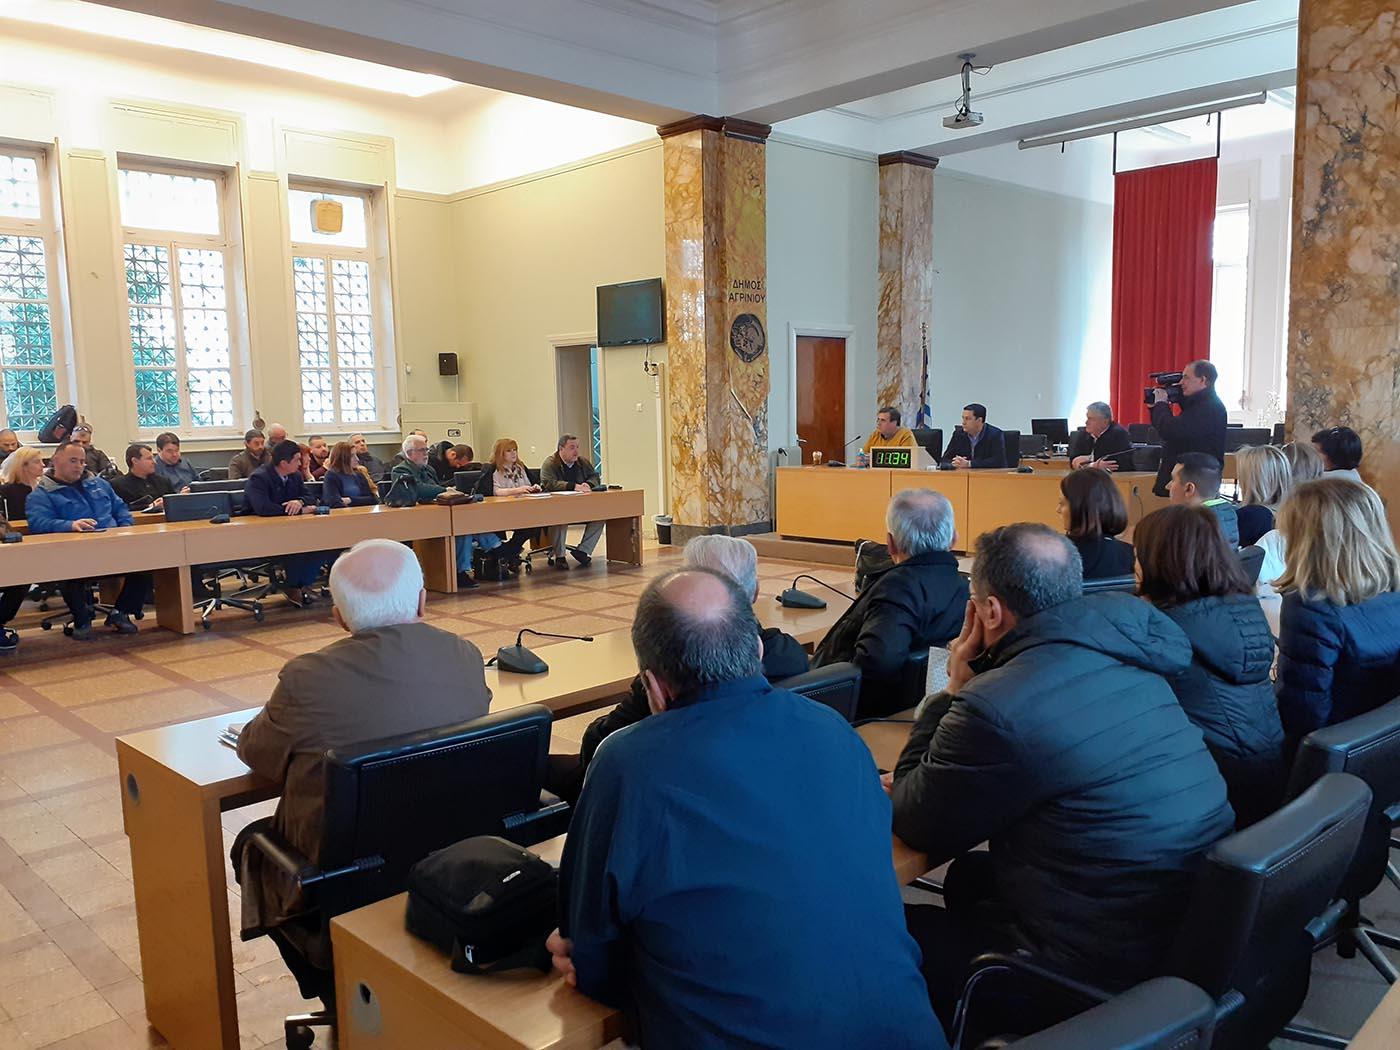 Aναστέλλει εώς και τη Δευτέρα τις εκδηλώσεις ο δήμος Αγρινίου